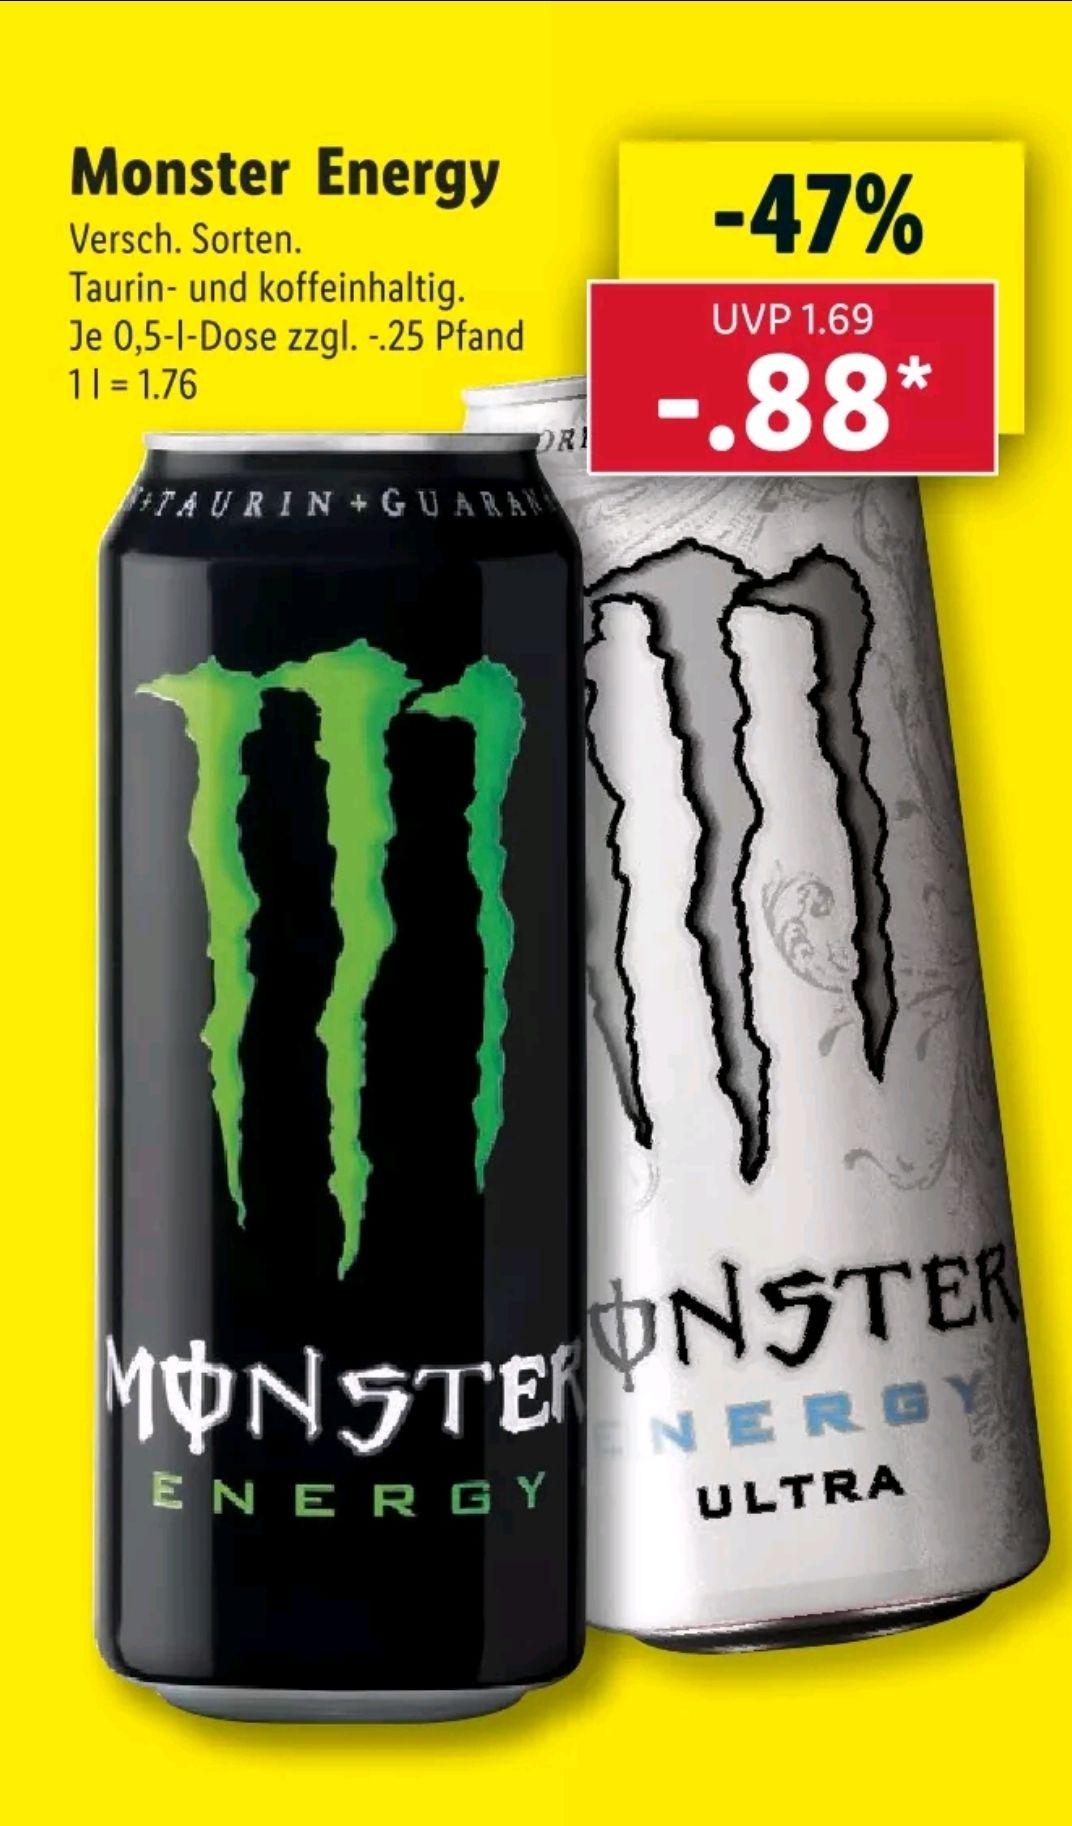 [Lidl] Ab 19.07 Monster Energy Drink für 0.88€